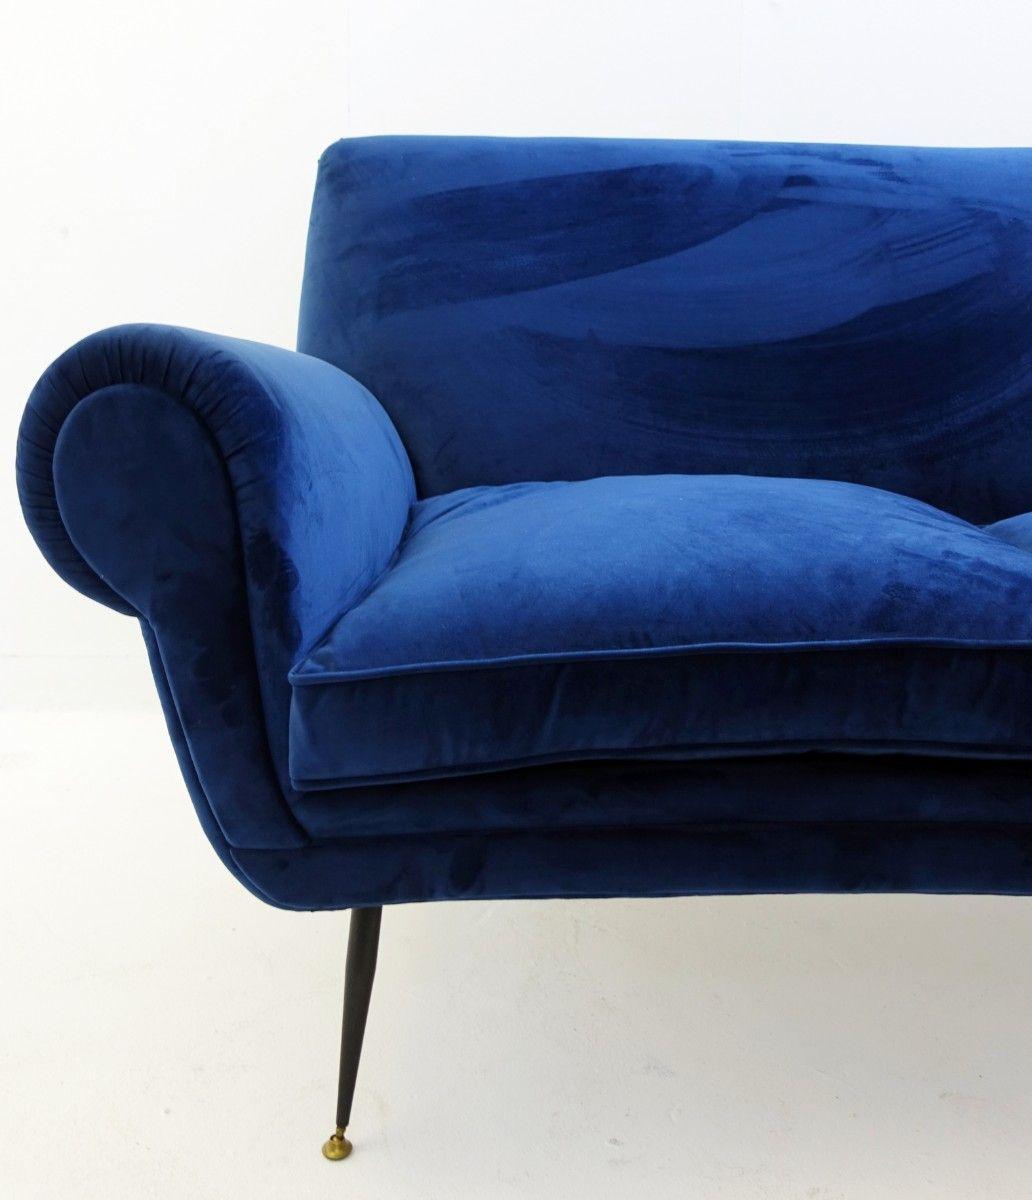 Vintage deep blue velvet sofa by gigi radice